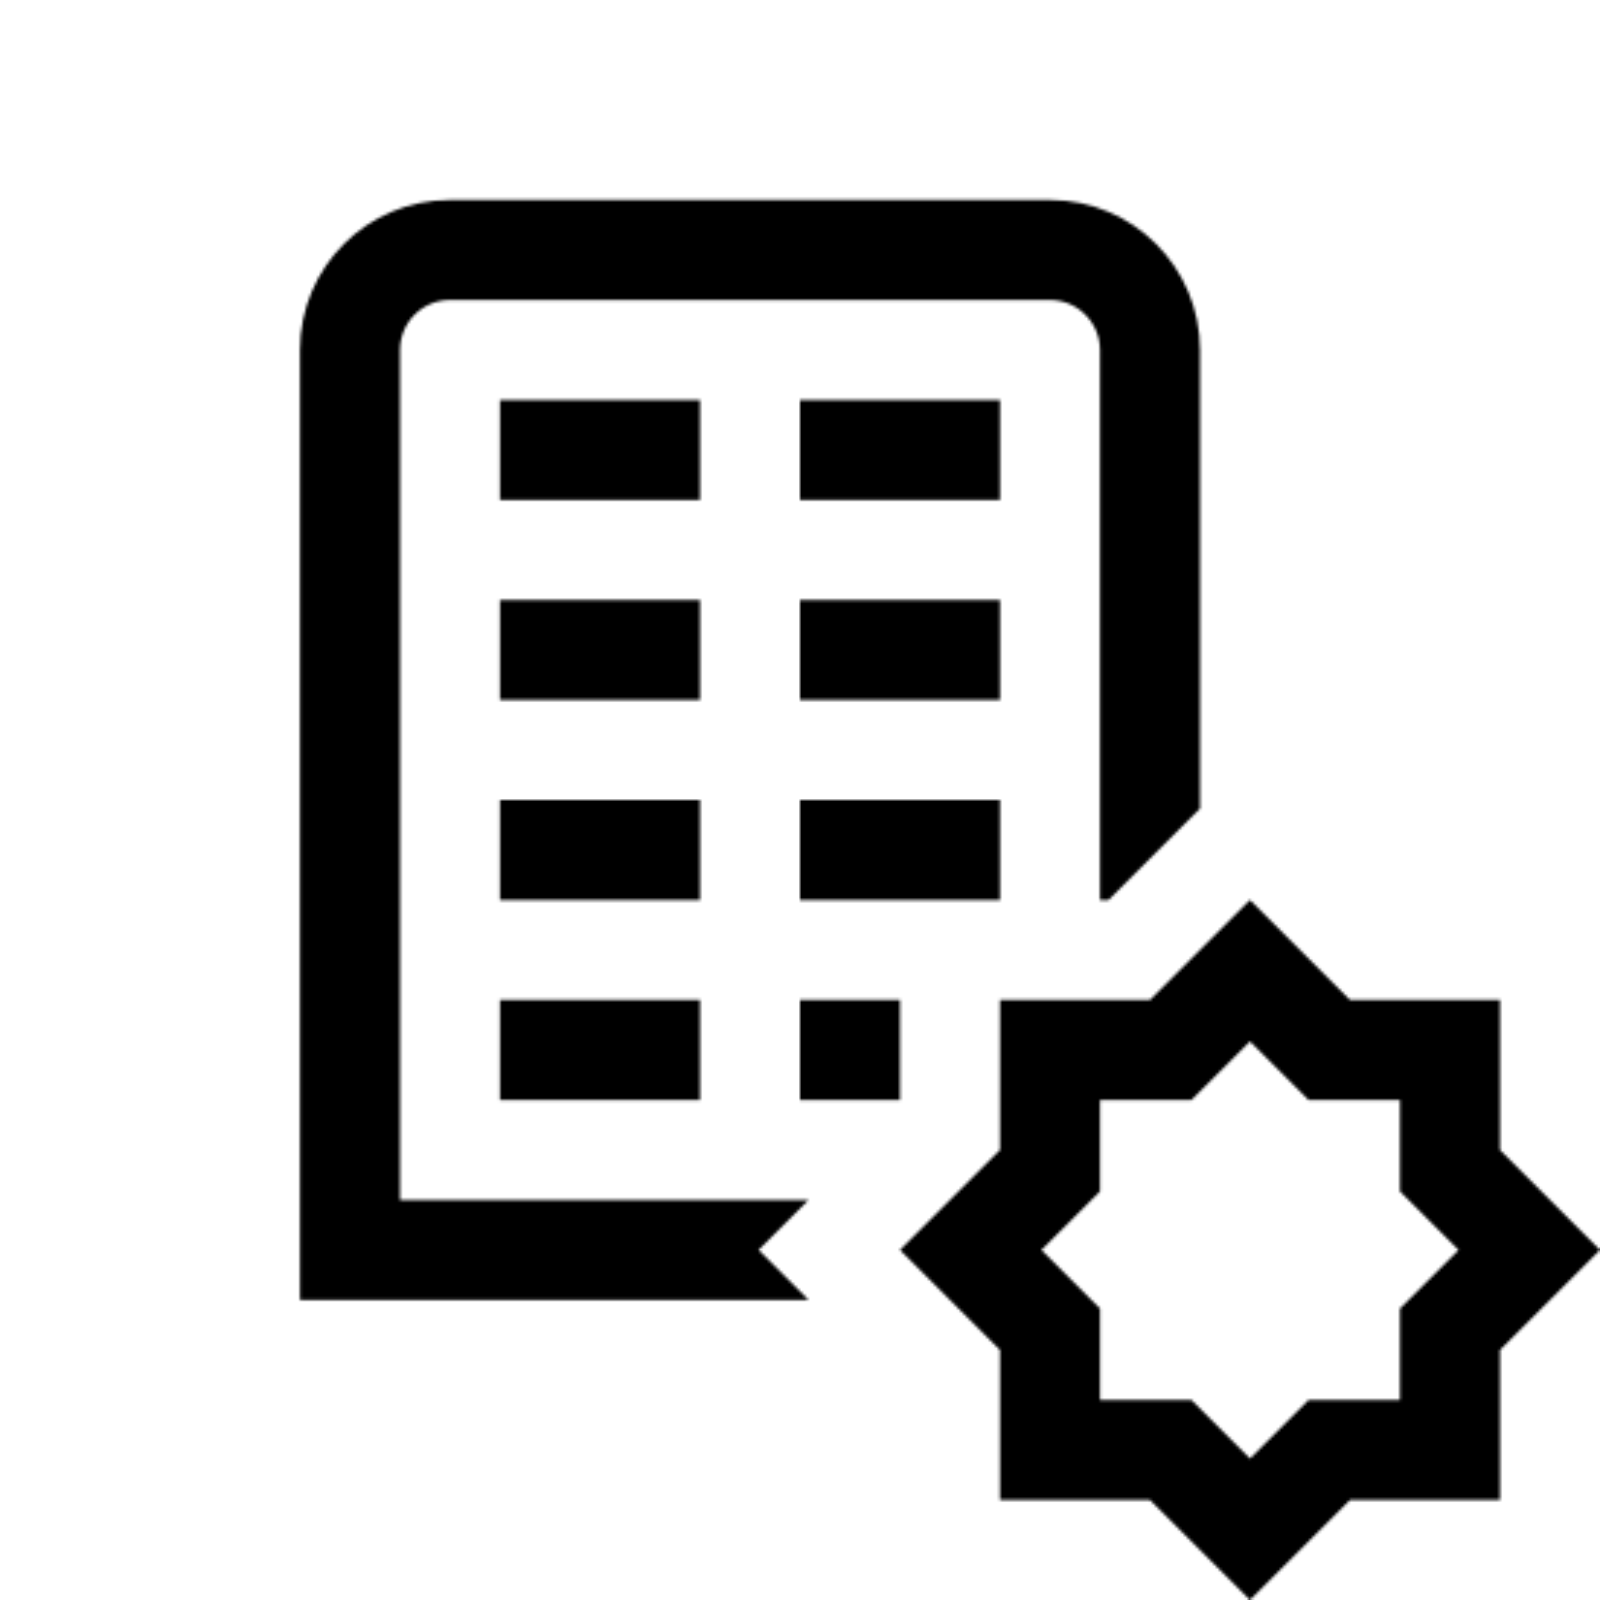 New Company icon